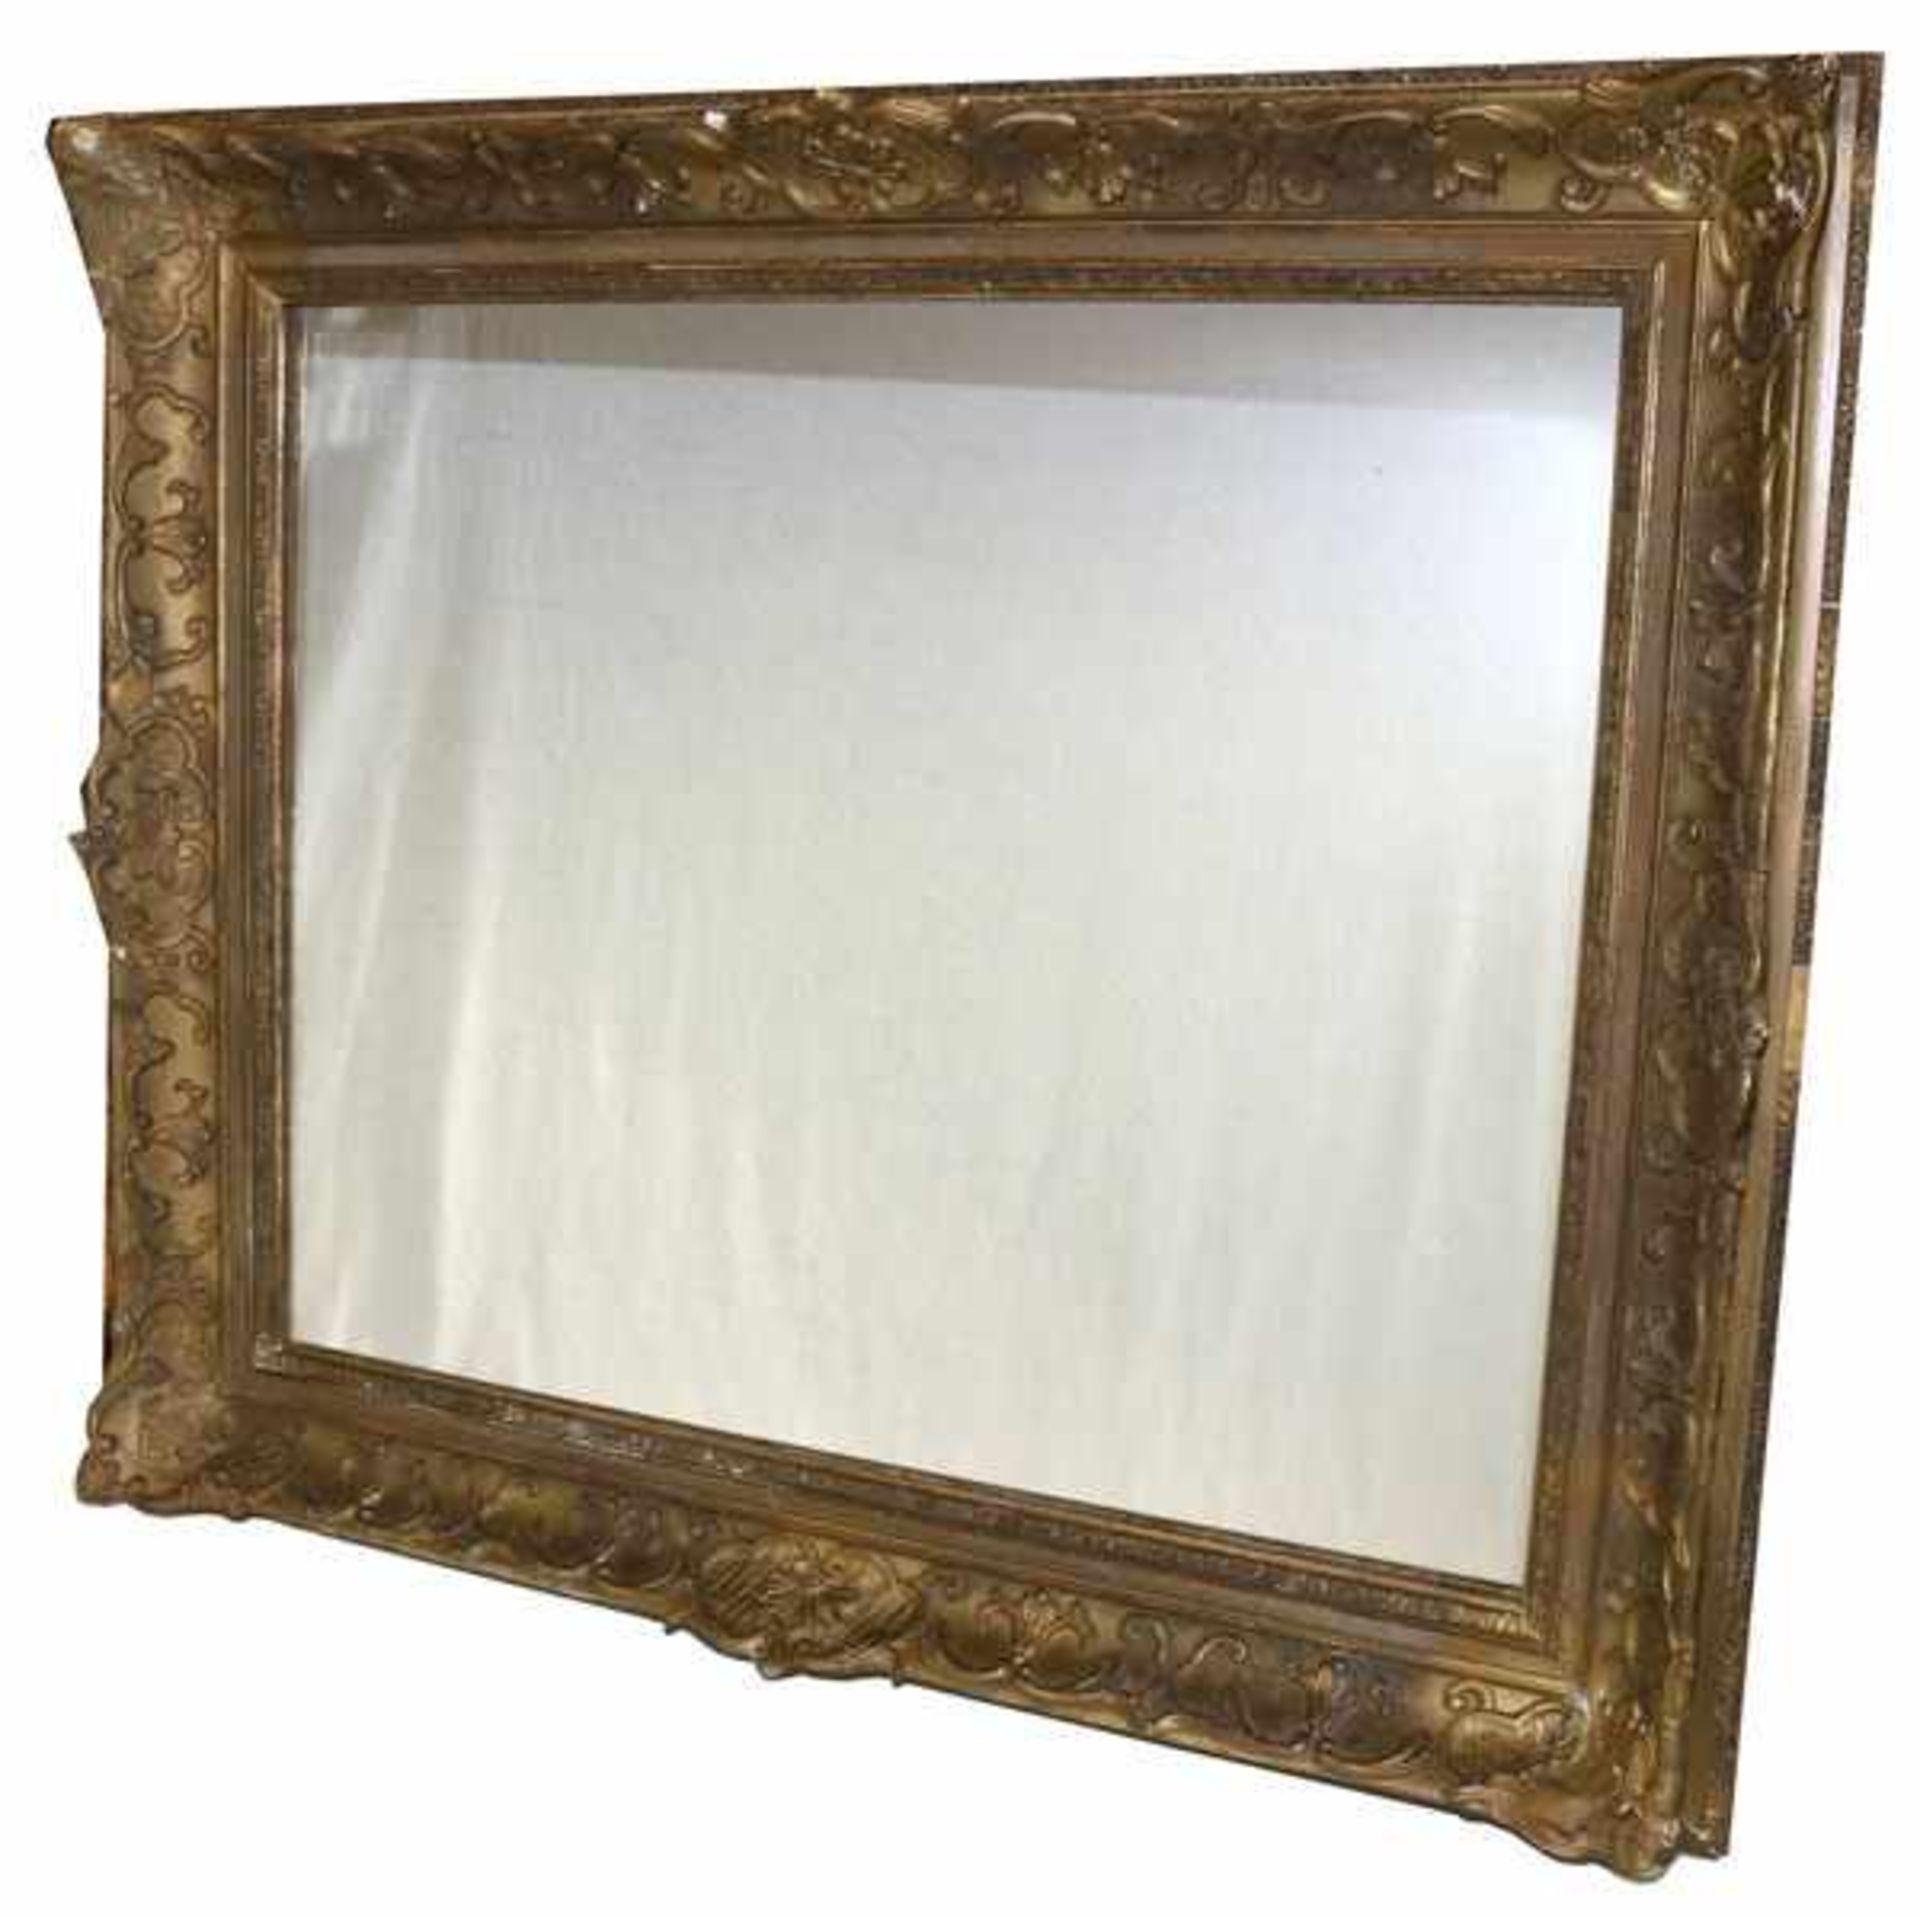 Los 154 - Wandspiegel in Goldrahmen, Rahmen bestossen und berieben, incl. Rahmen 75 cm x 86 cm